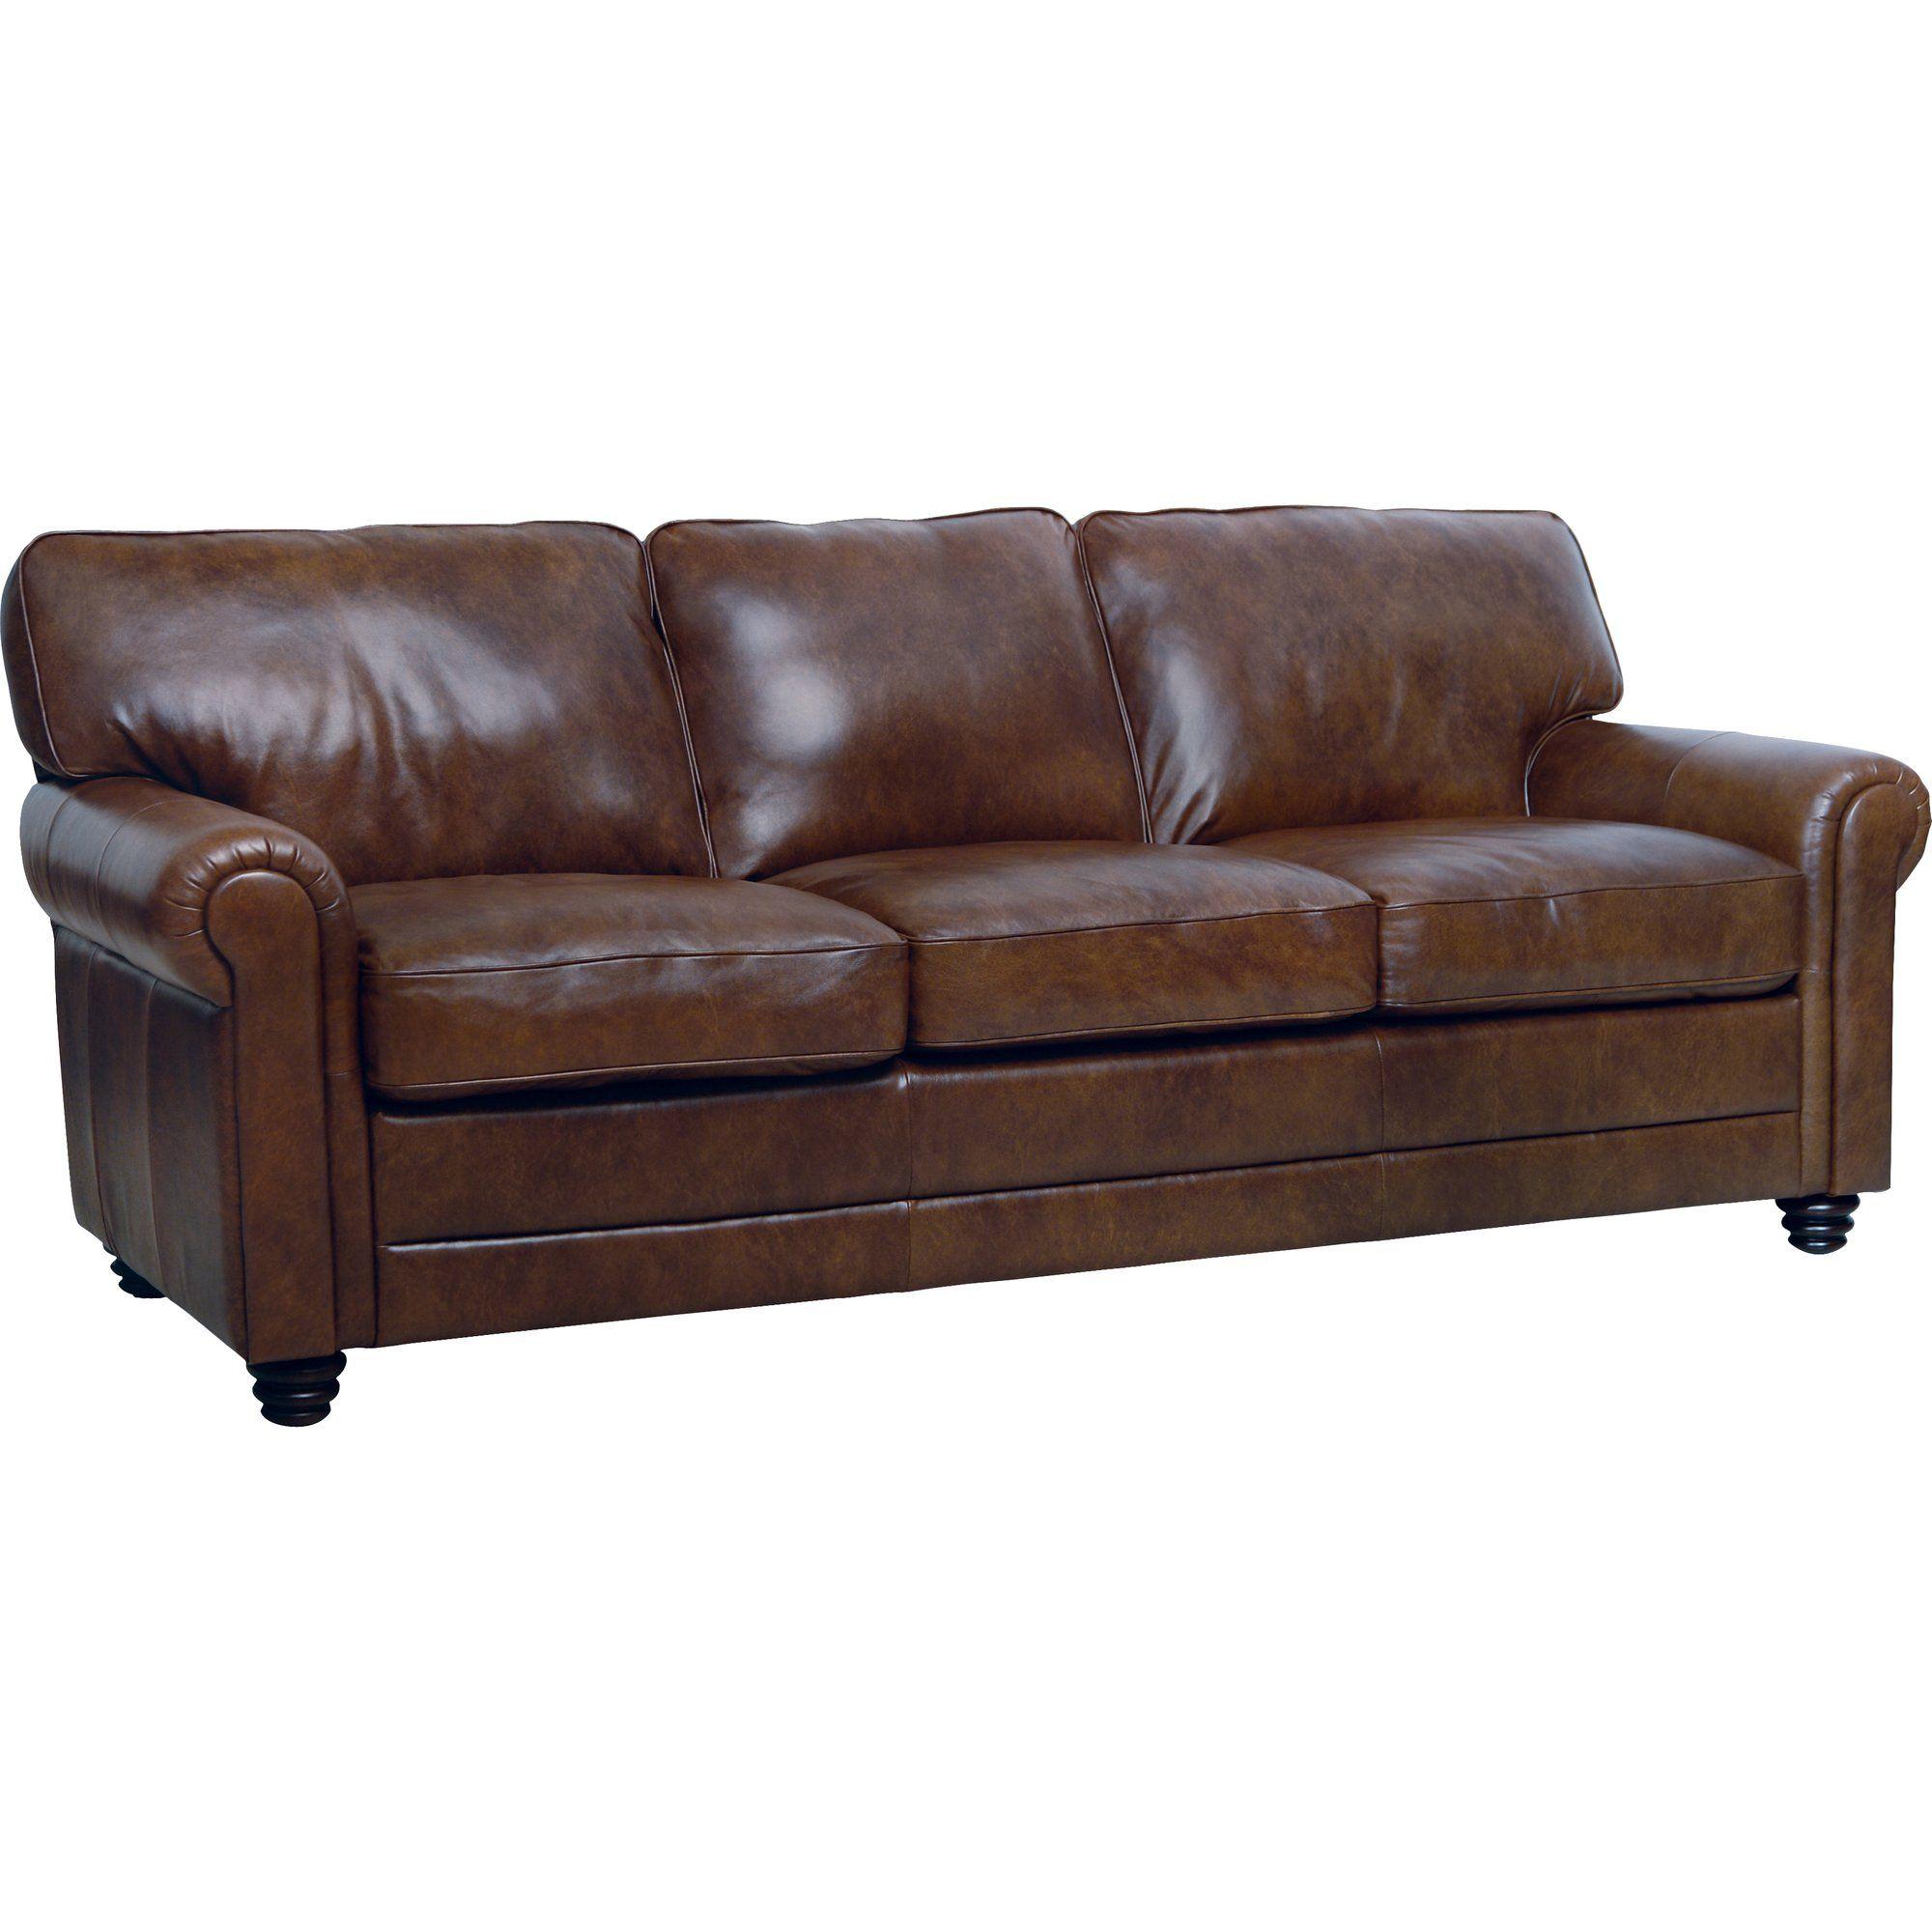 Enjoyable Lambdin Leather Sofa Italian Leather Sofa Best Leather Machost Co Dining Chair Design Ideas Machostcouk